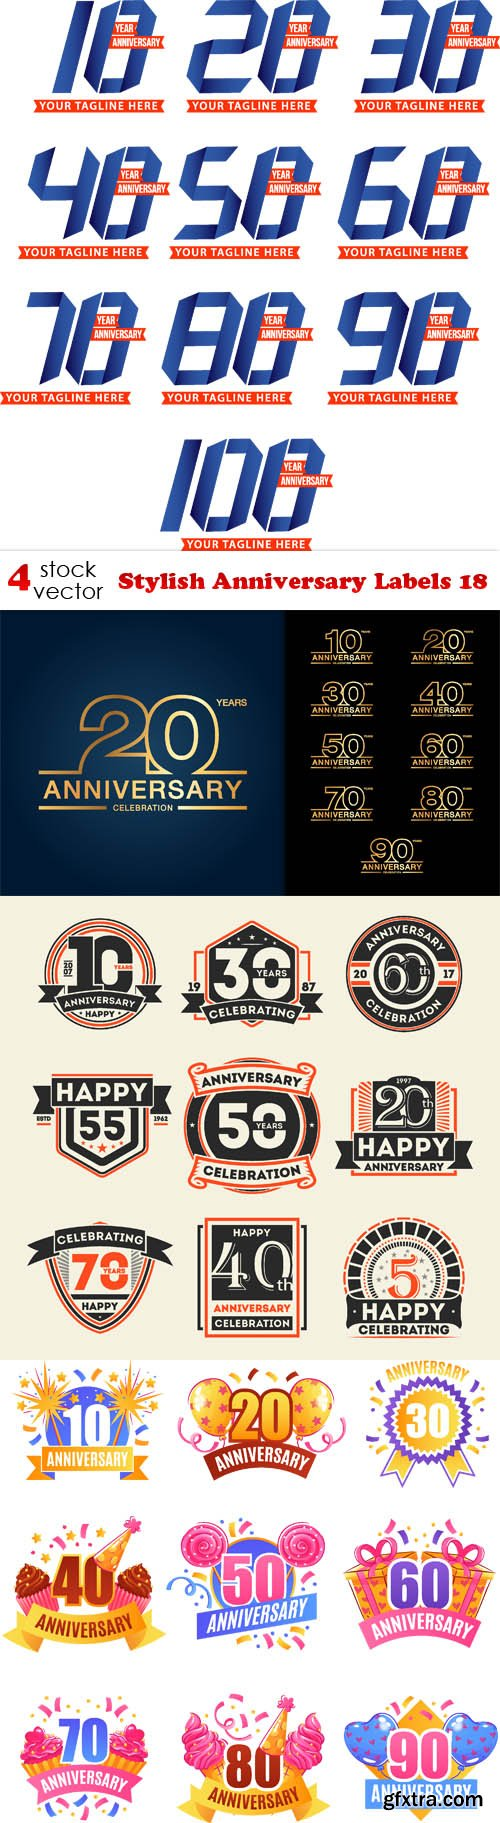 Vectors - Stylish Anniversary Labels 18